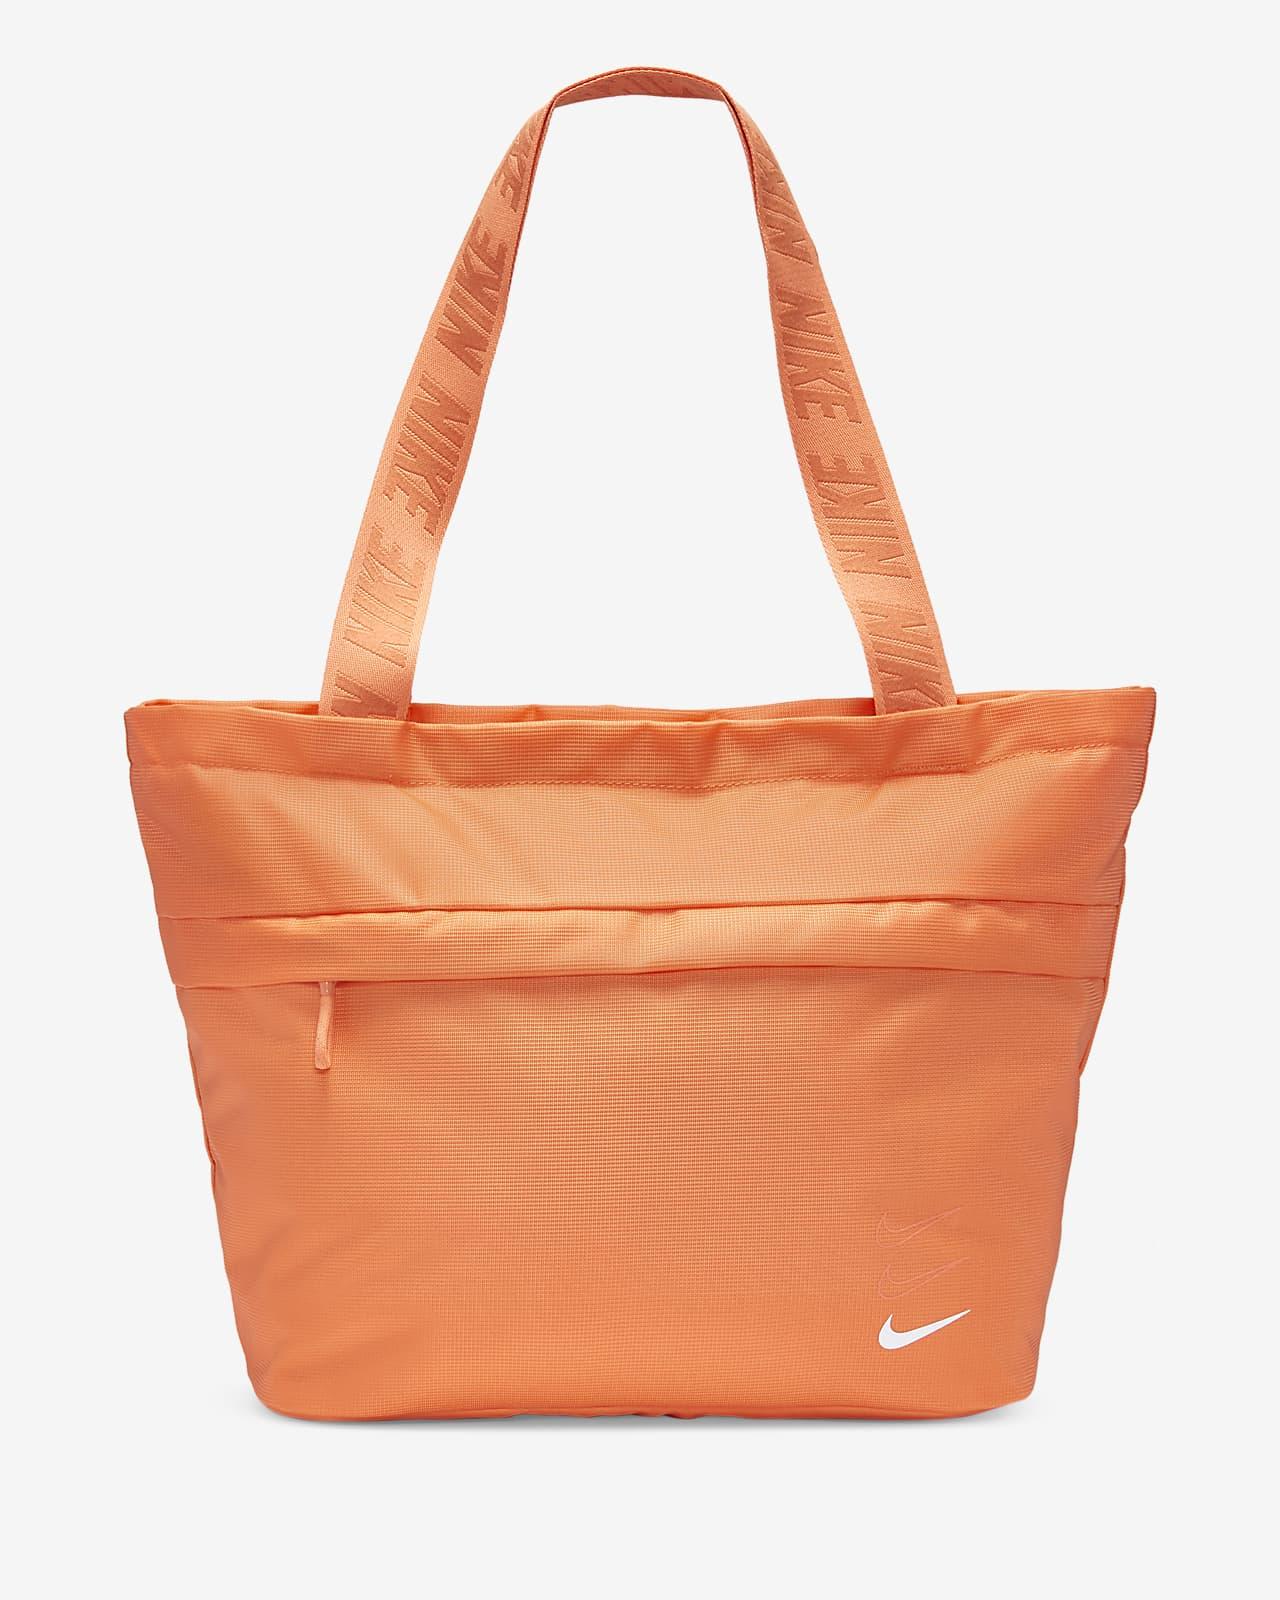 Tote bag Nike Sportswear Essentials